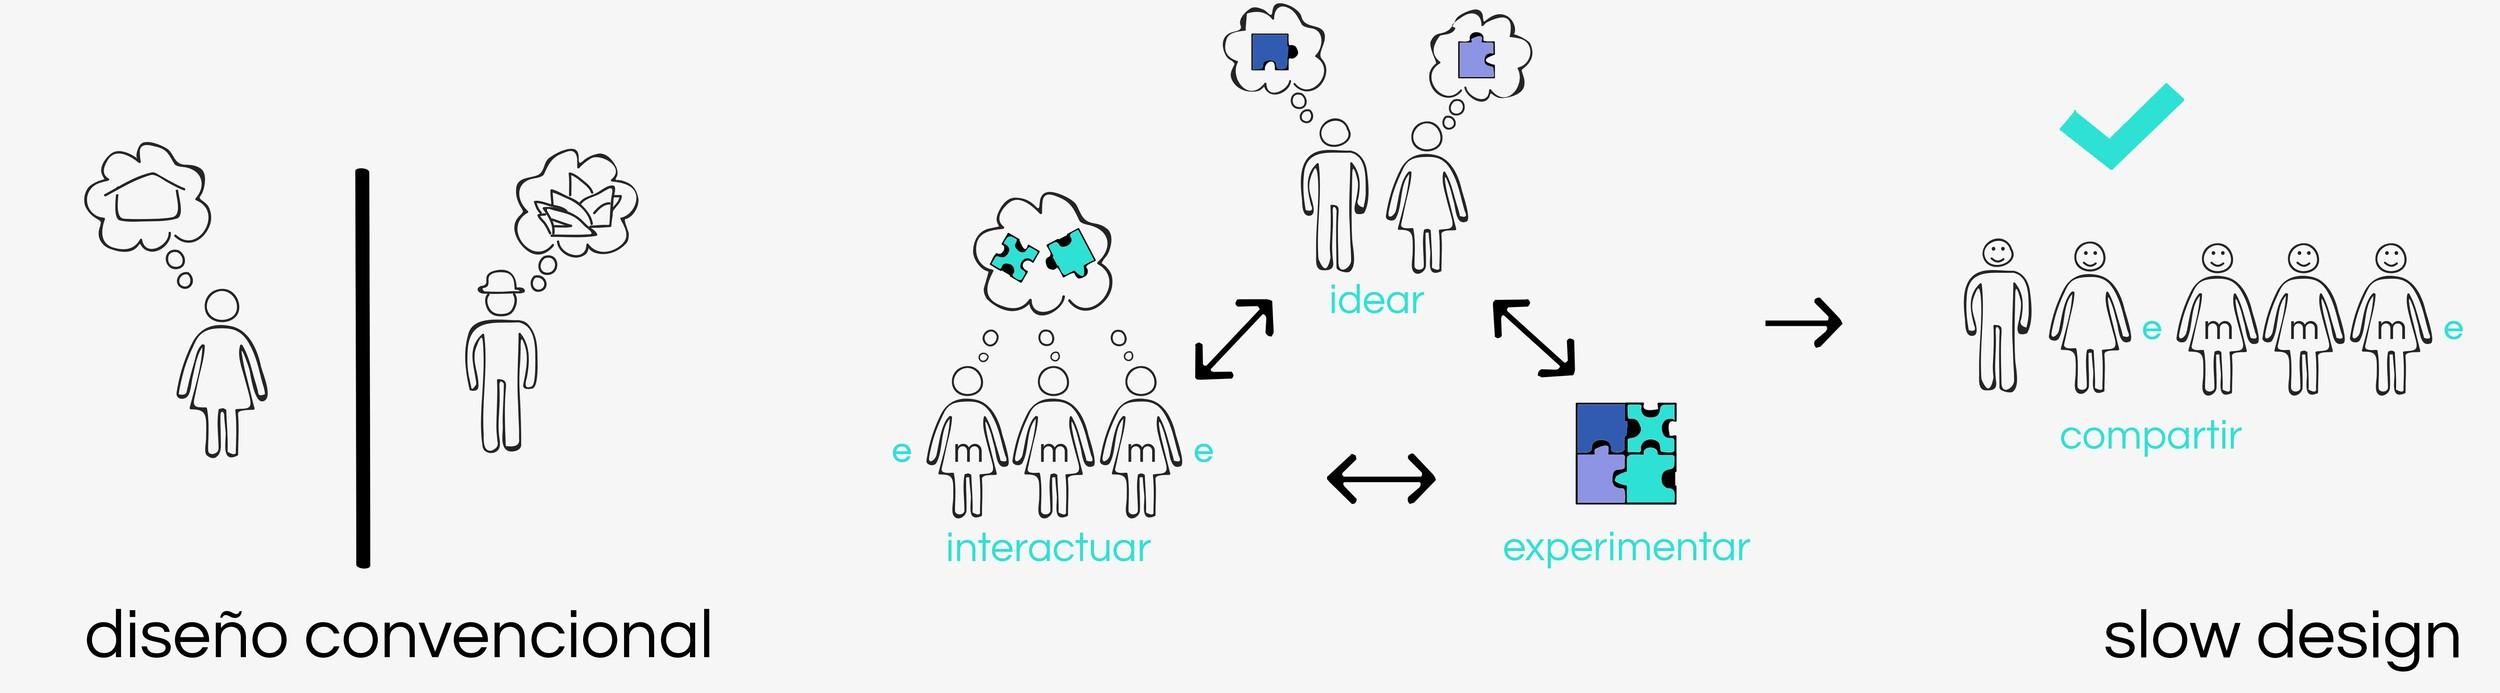 emmme-filosofía-slowdesign-02experimentardialogar.jpg